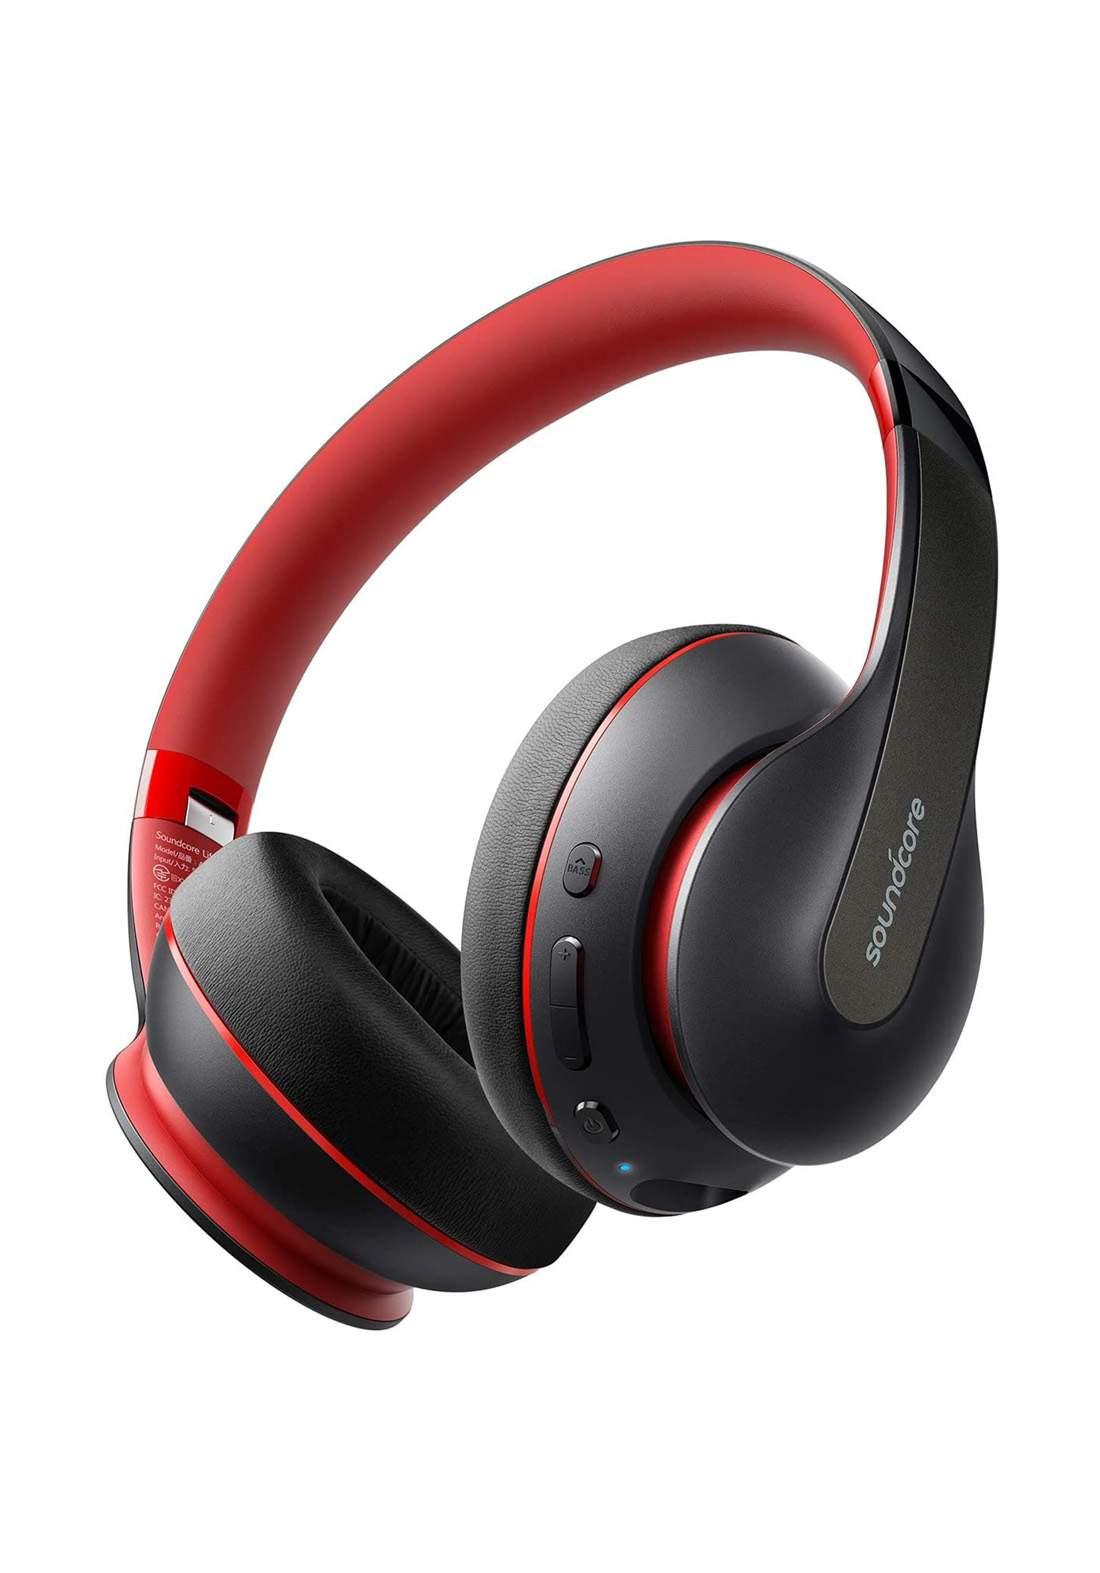 Anker Soundcore Life Q10 Wireless Bluetooth Headphones-Black سماعة رأس